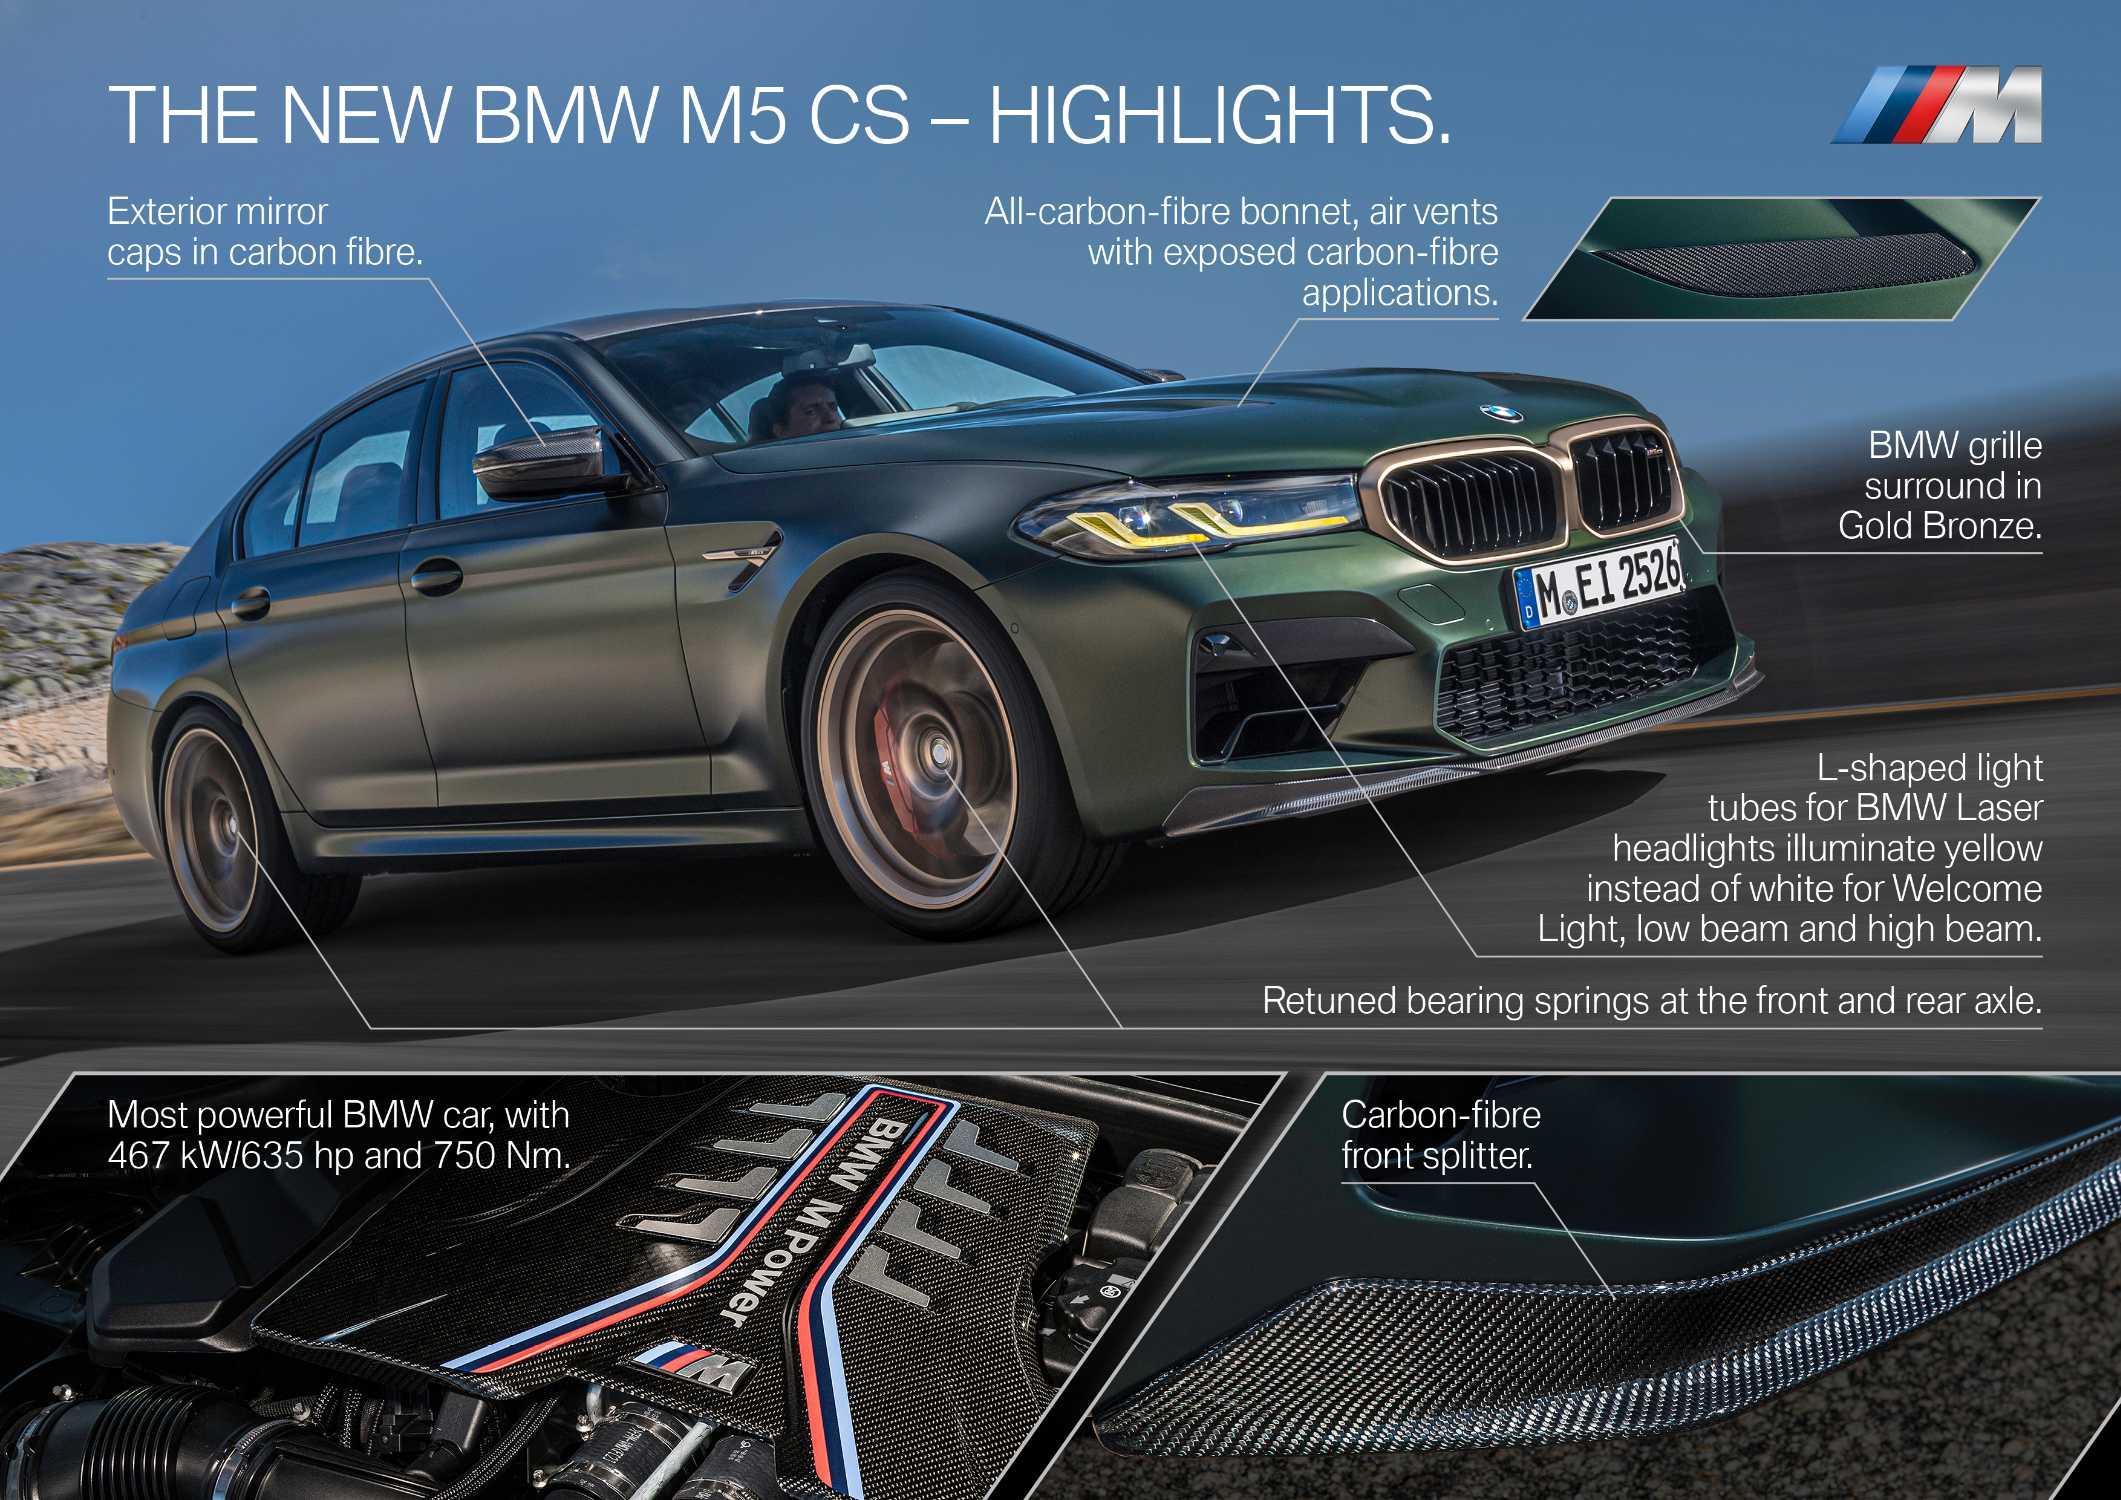 The new BMW M5 CS – Highlights (01/2021).